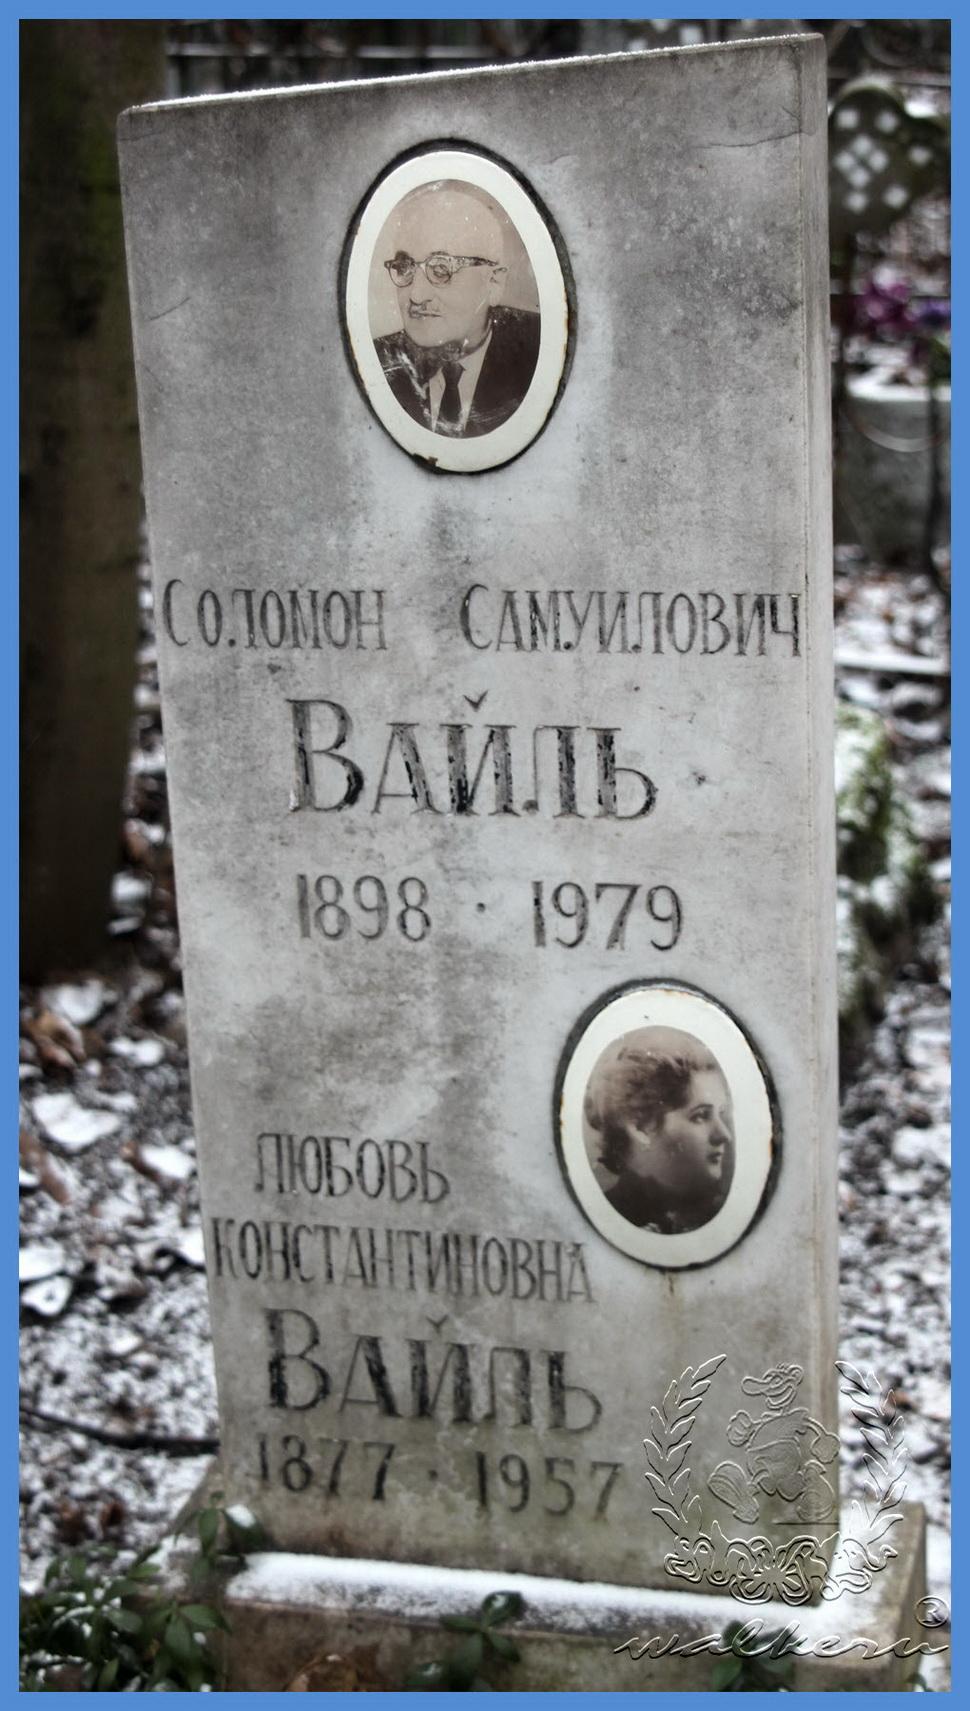 Вайль Соломон Самуилович